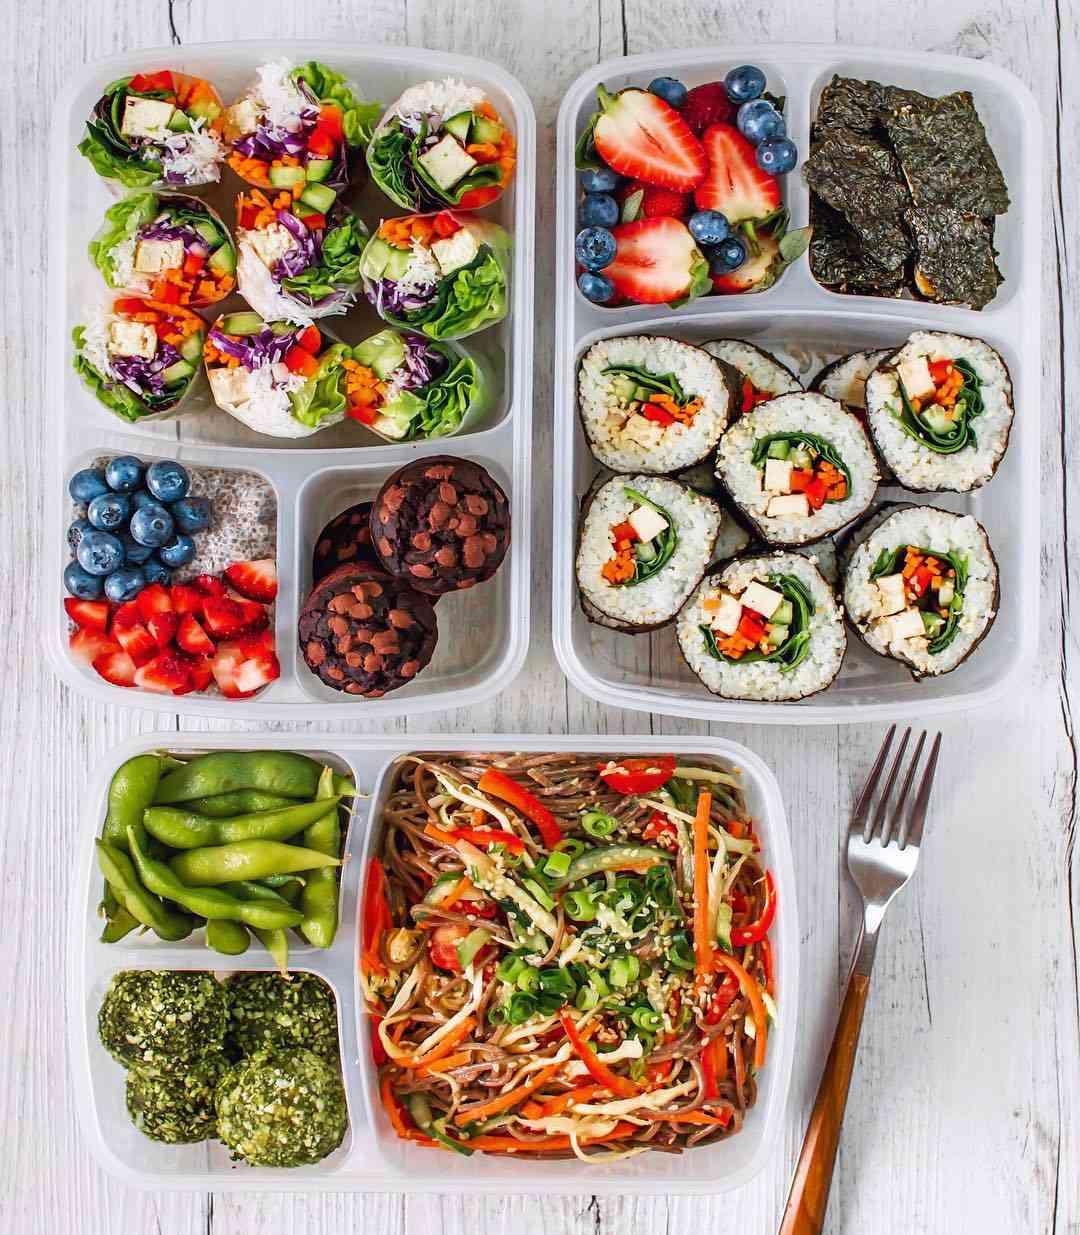 Vegan sushi lunch - @thrivingonplants